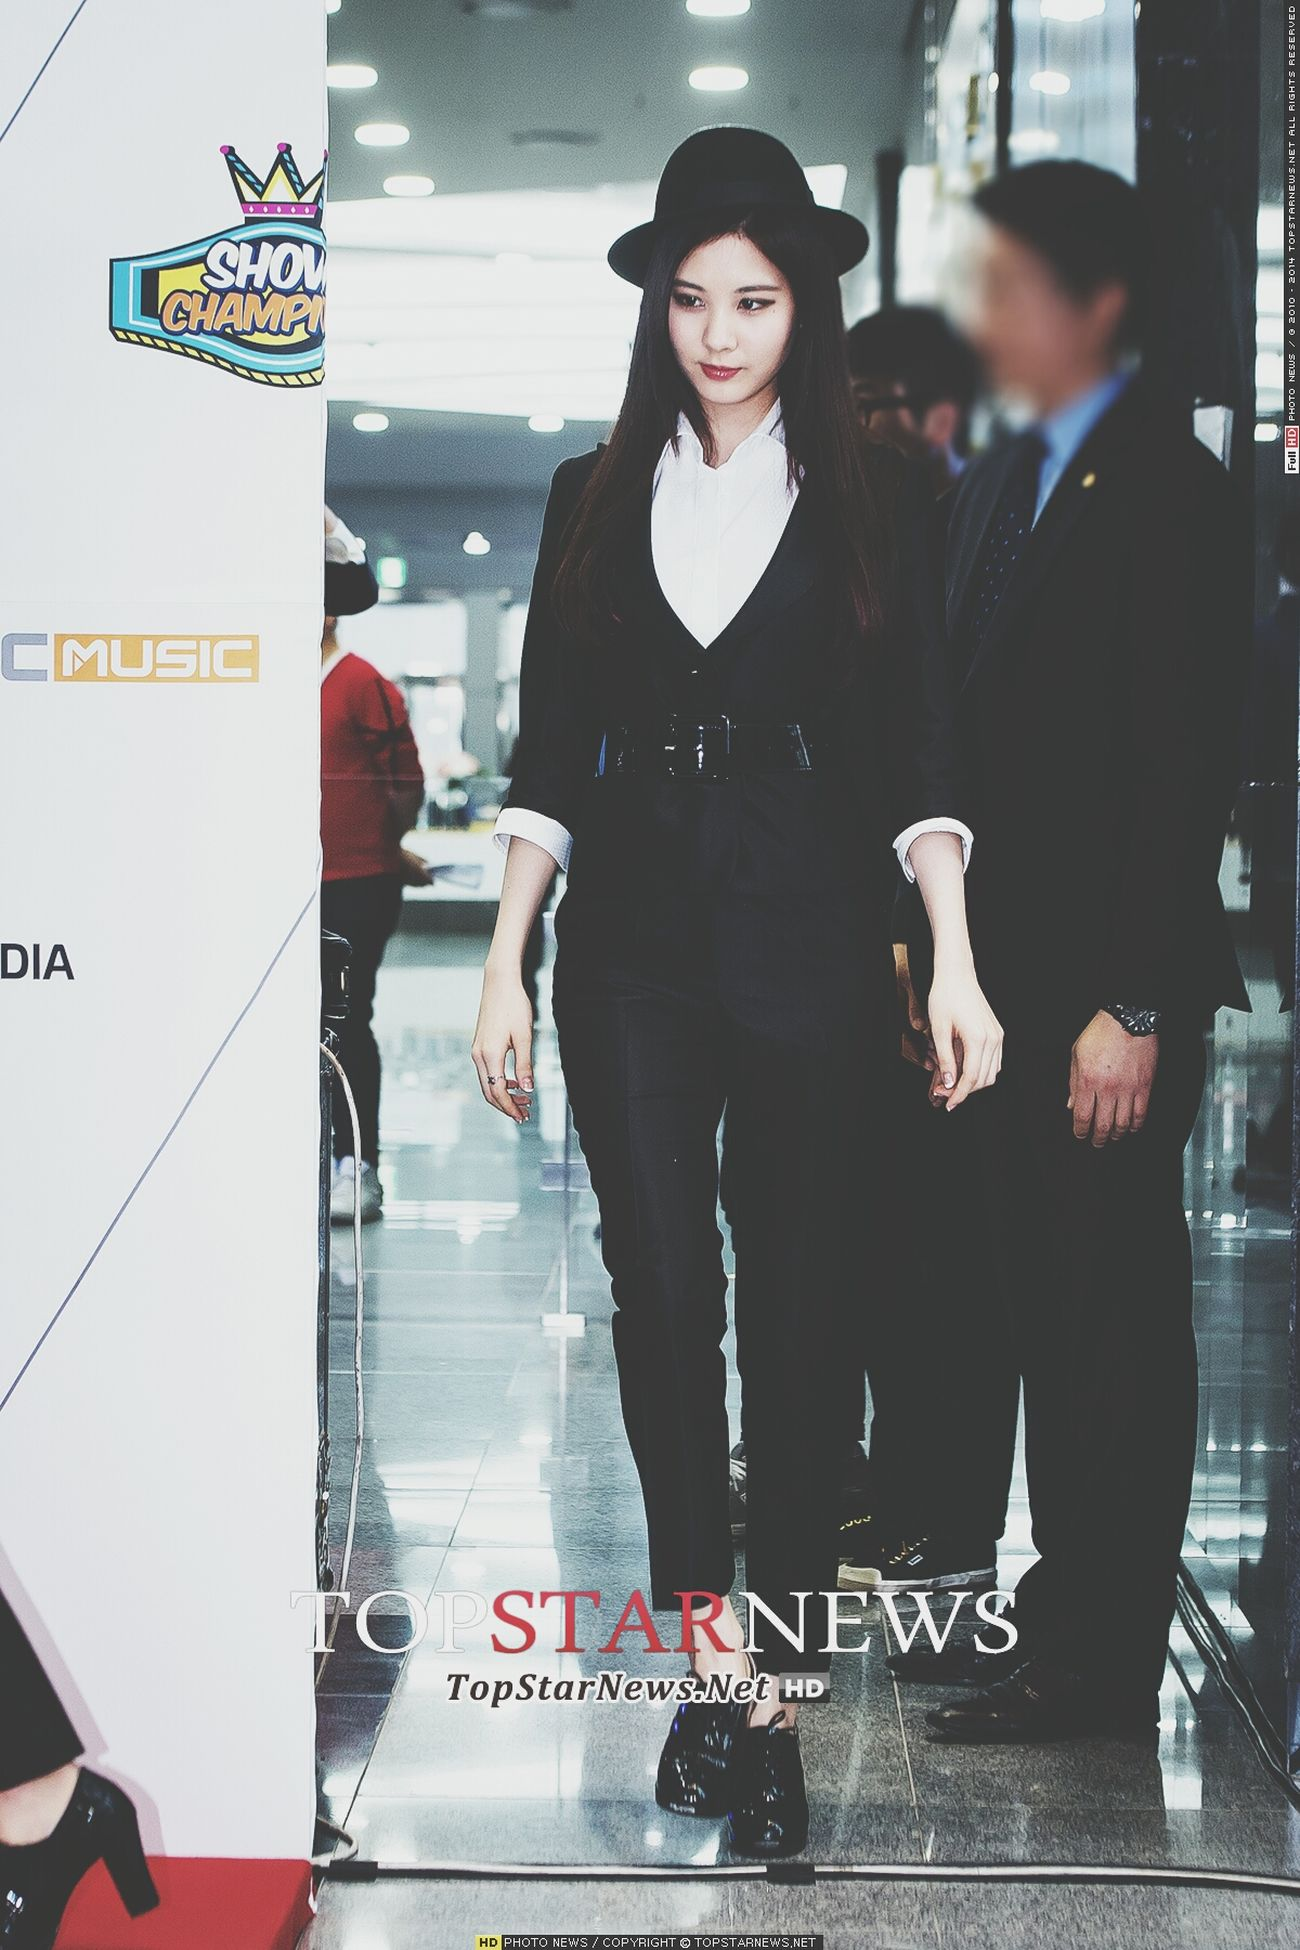 [UPDATE] 140319 SNSD @ MBC Champion 100th Special Red Carpet -[©TopStarNews] Seohyun SNSD GirlsGeneration Soshi